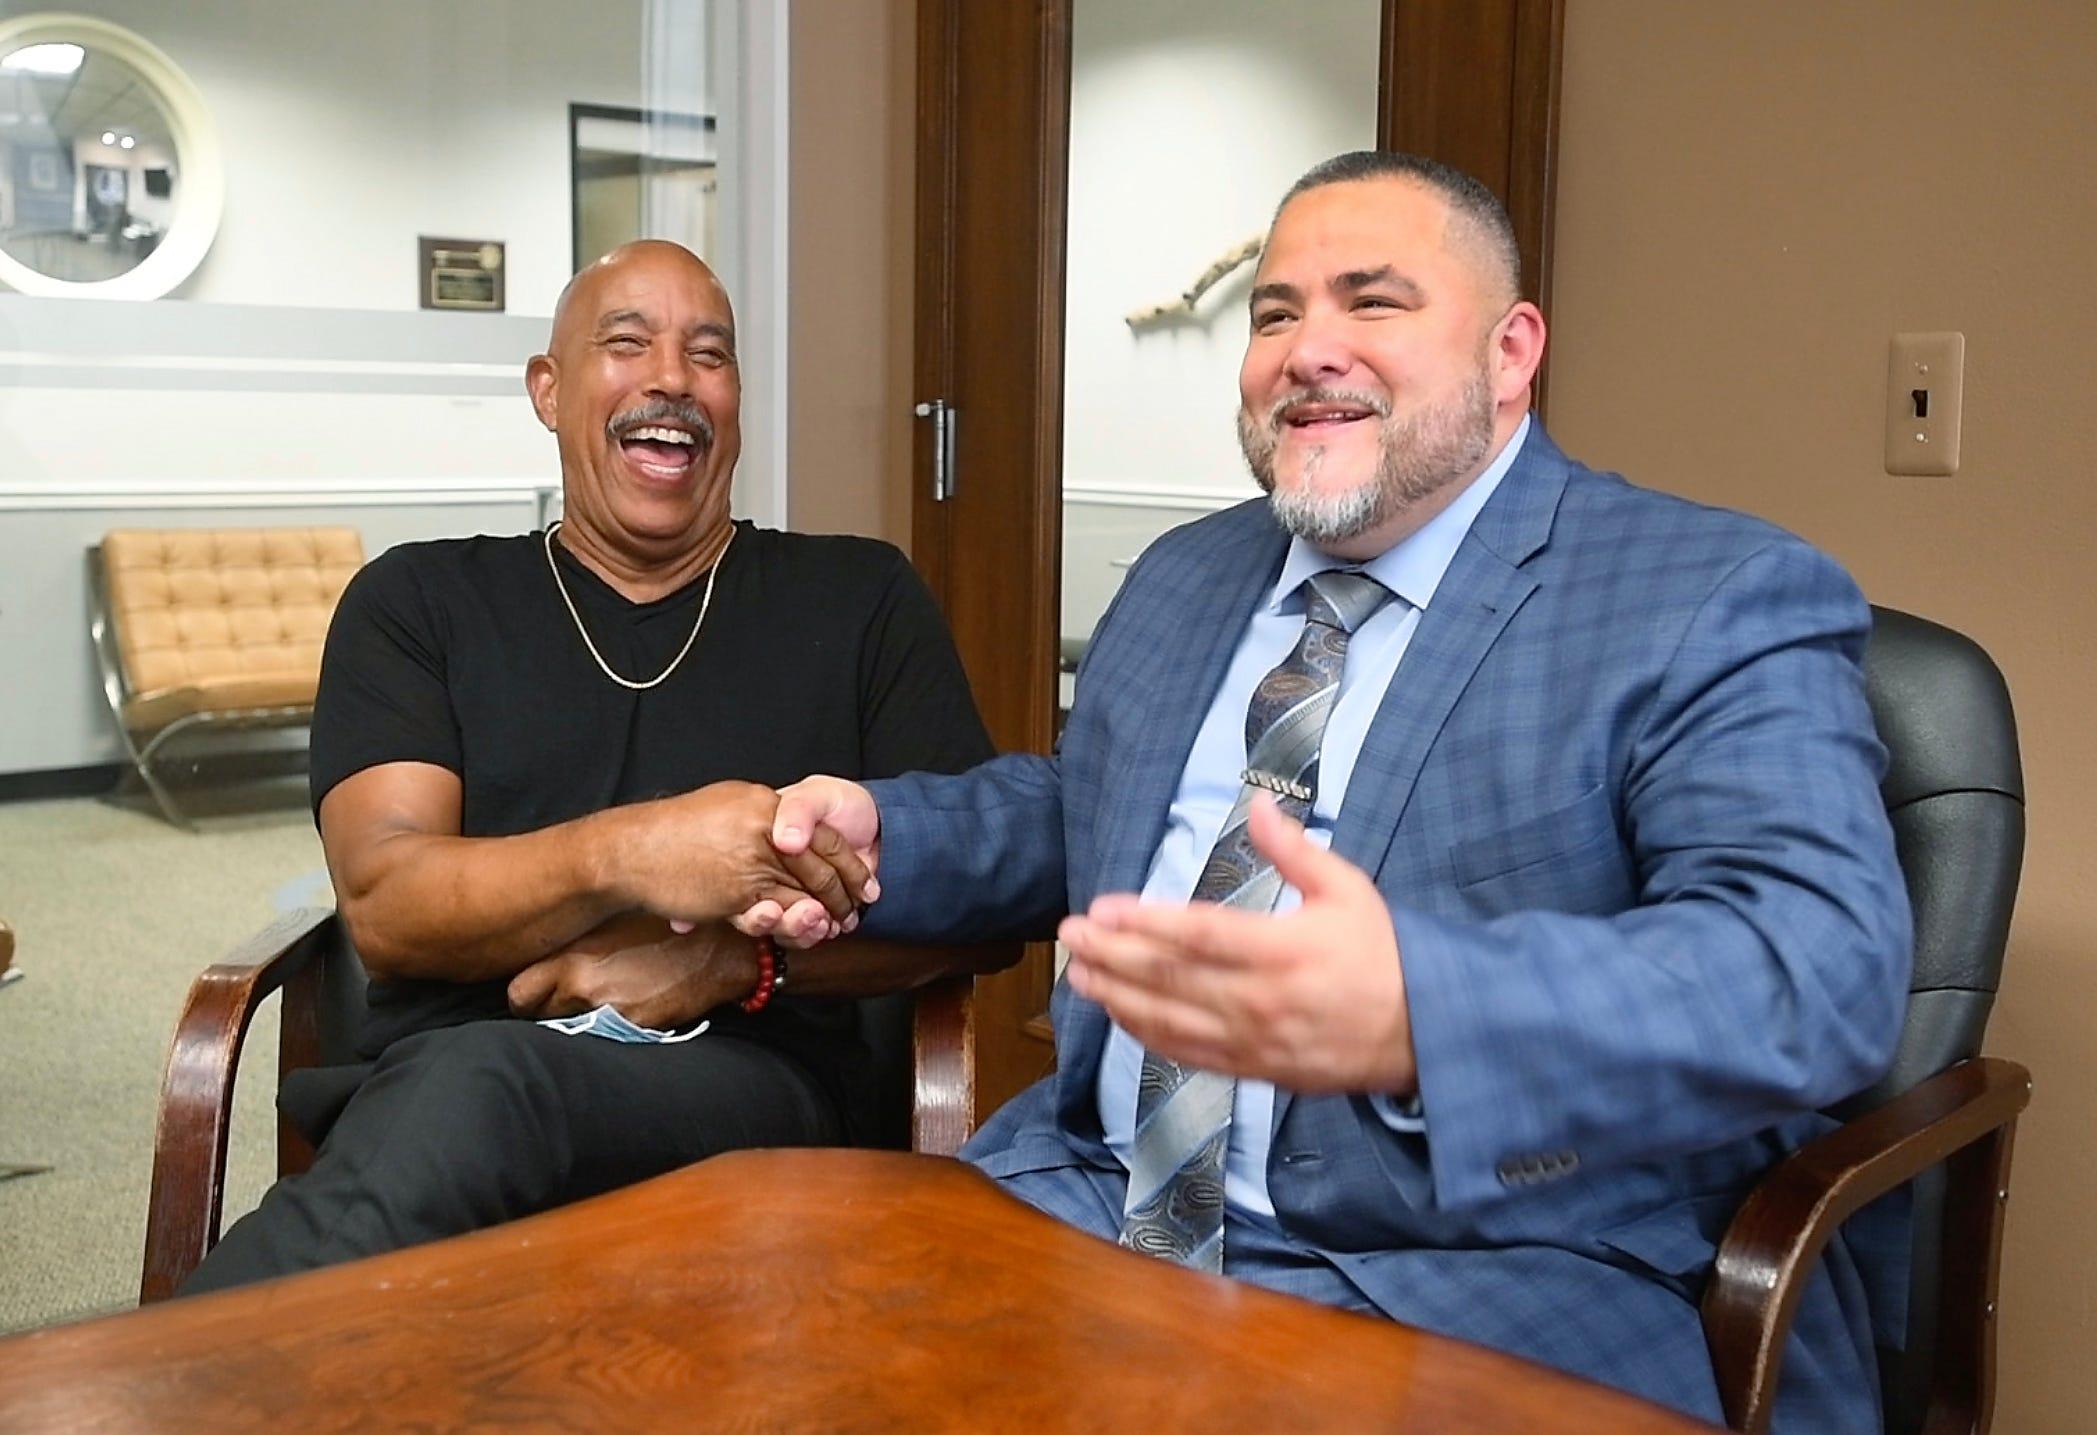 'A felon with a dream': How a former drug dealer became a Detroit lawyer